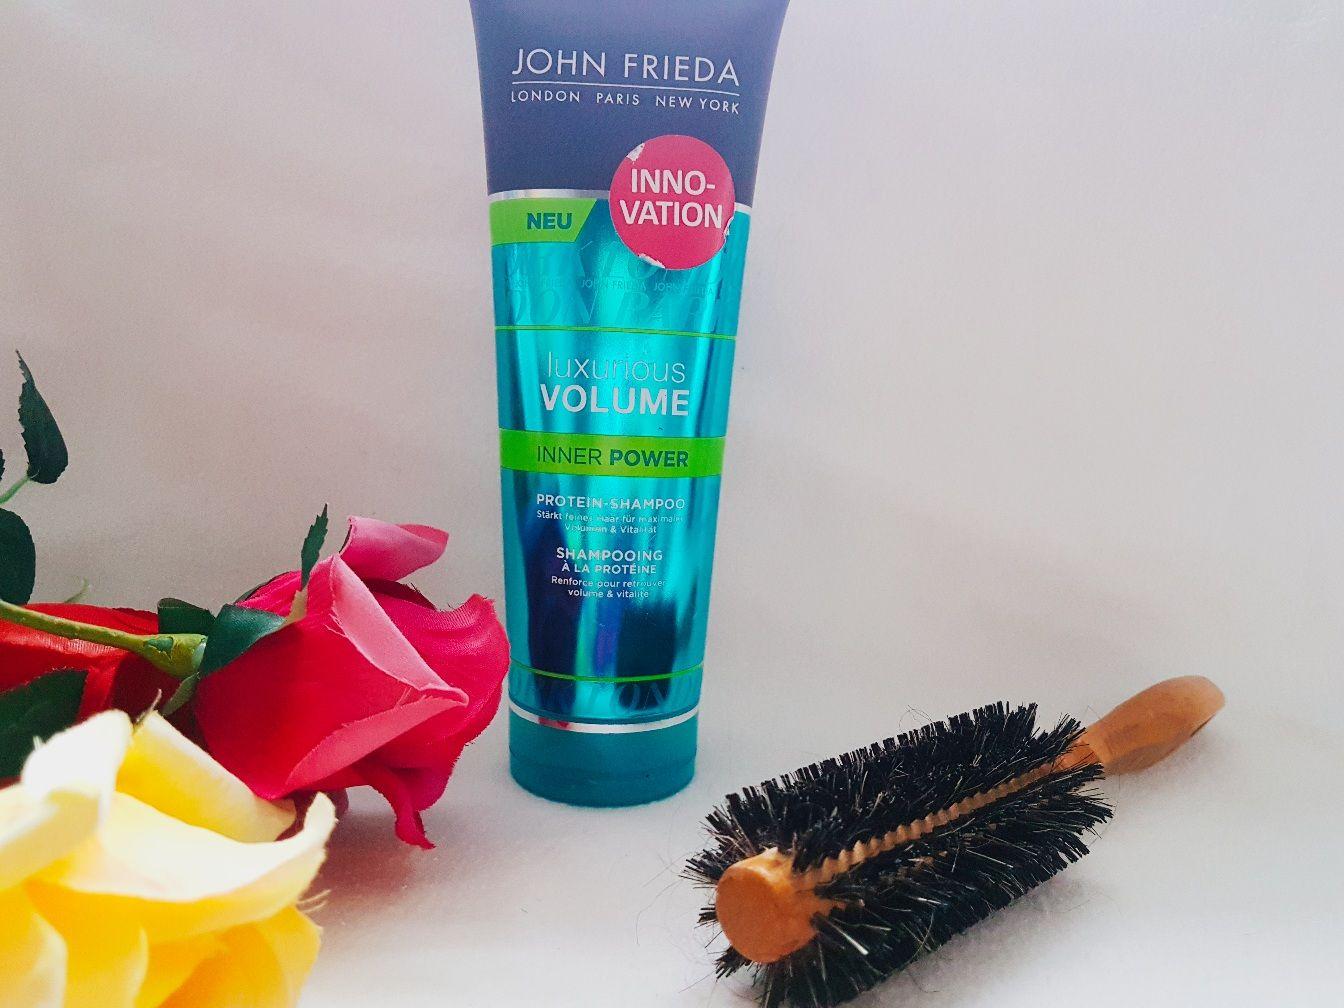 Luxurious Volume Inner Power Protein Shampoo